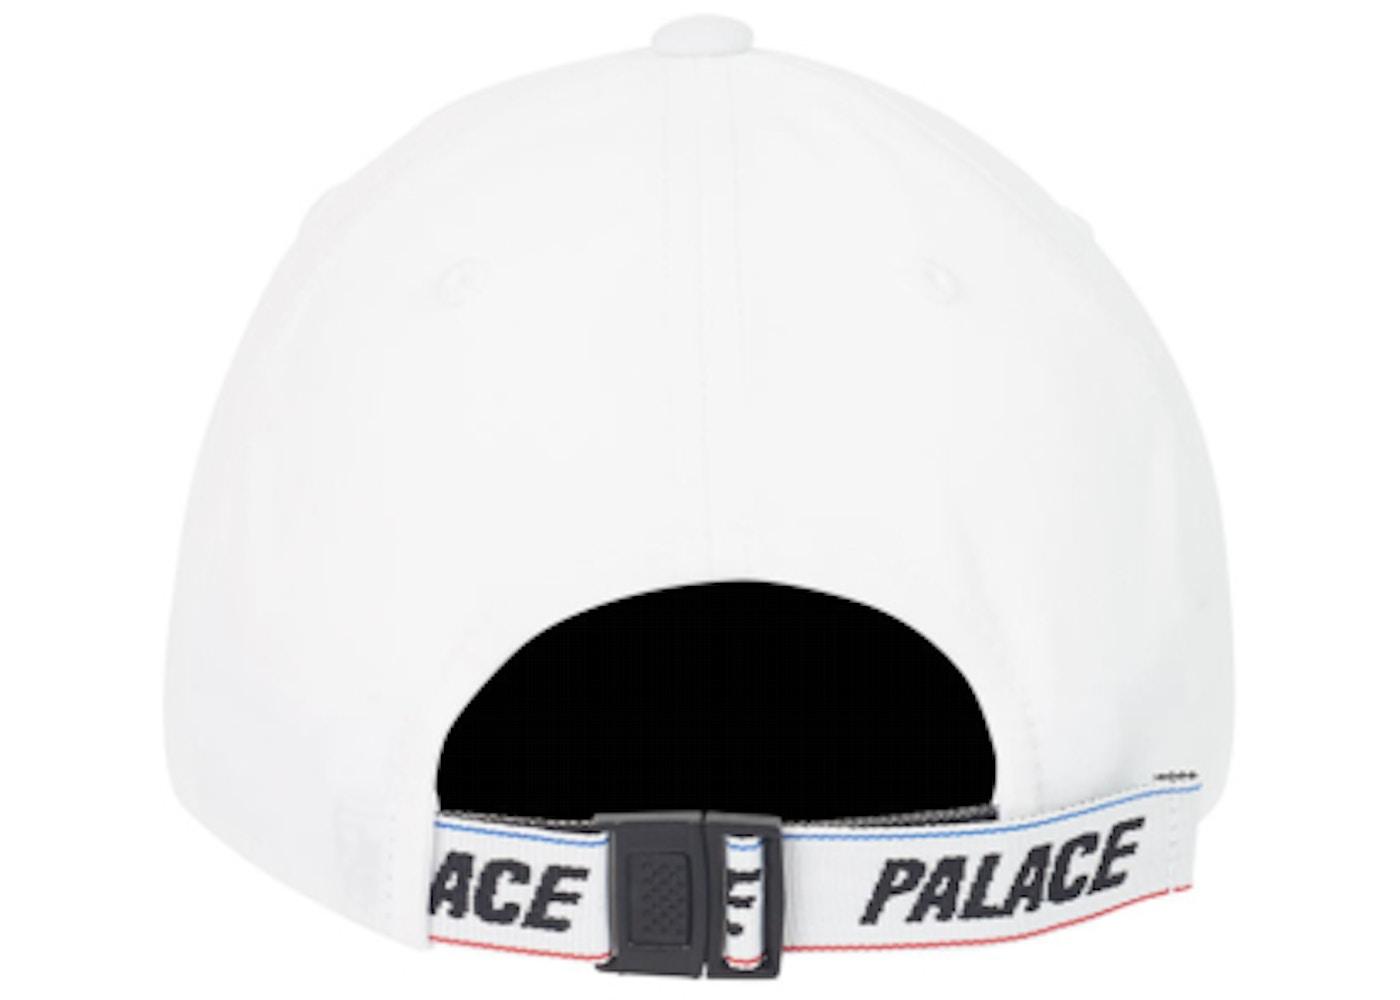 e806c70a2 Palace Basically A Sports Shell 6-Panel White - SS19